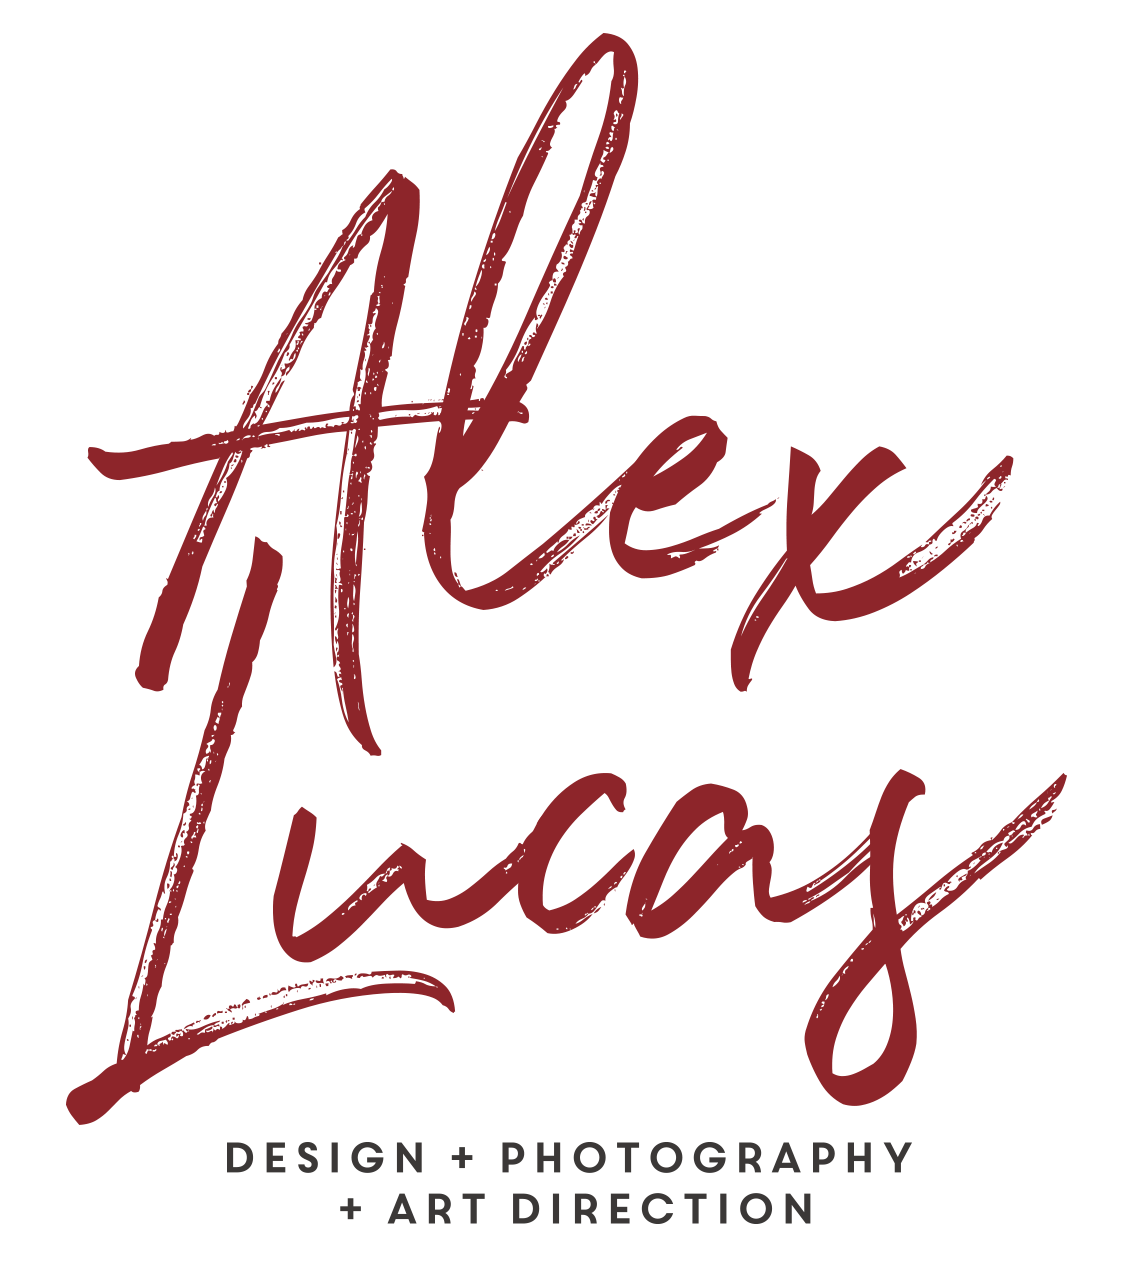 Alex Lucas